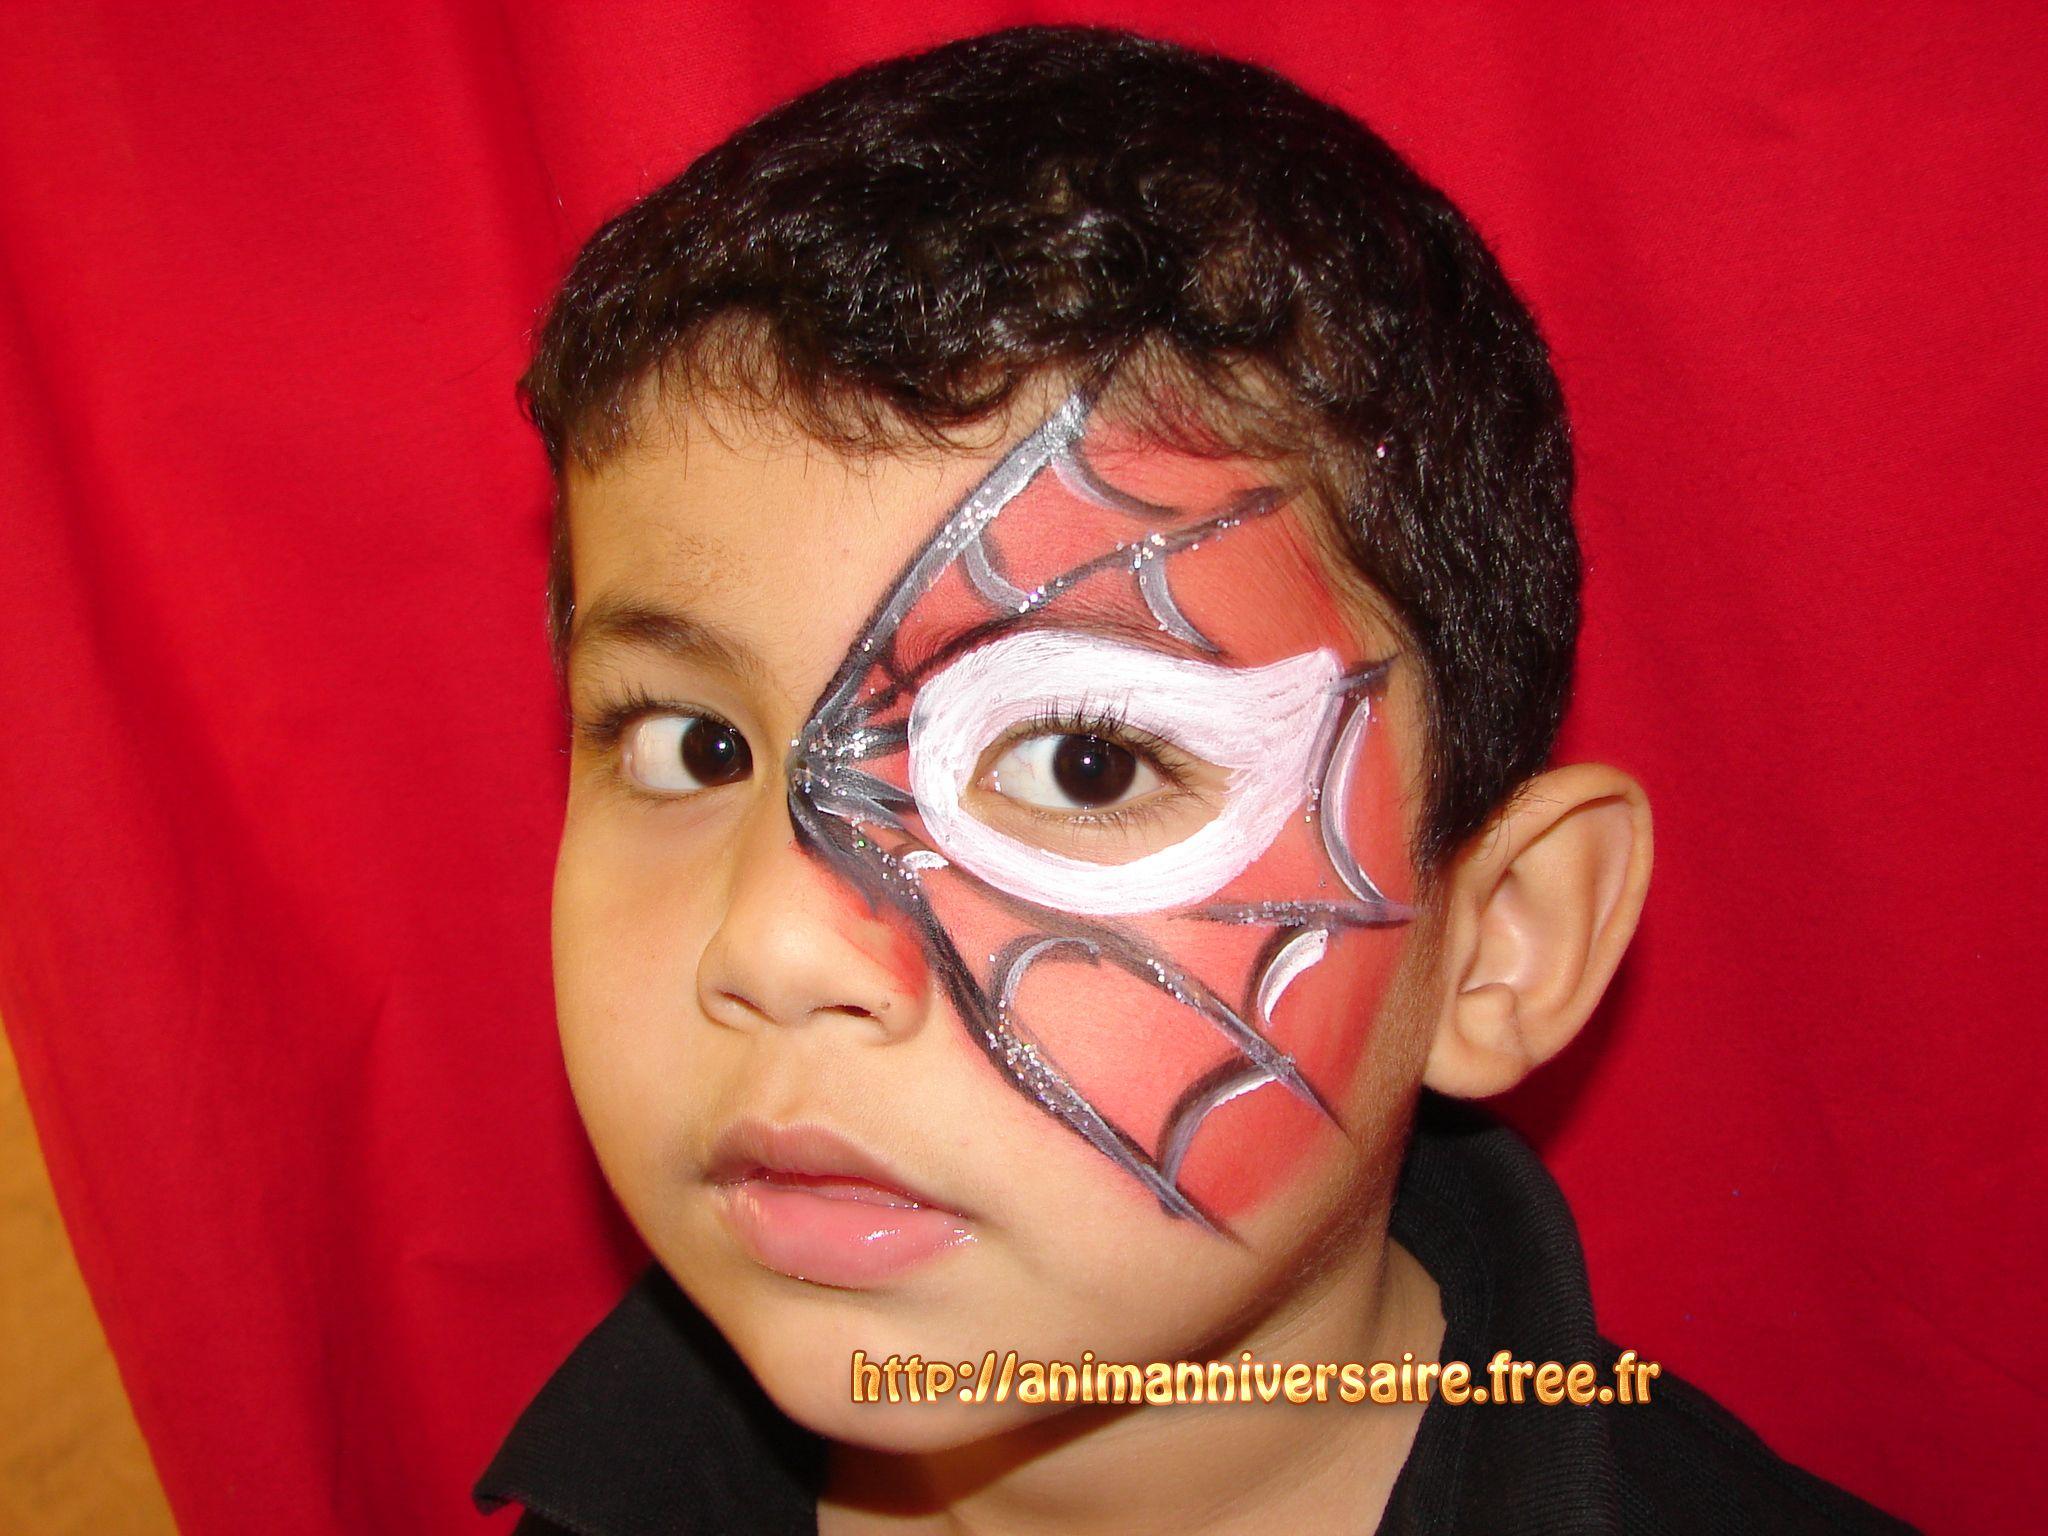 Pingl par rosalie g rard sur maquillage kermesse enfants - Modele maquillage princesse ...